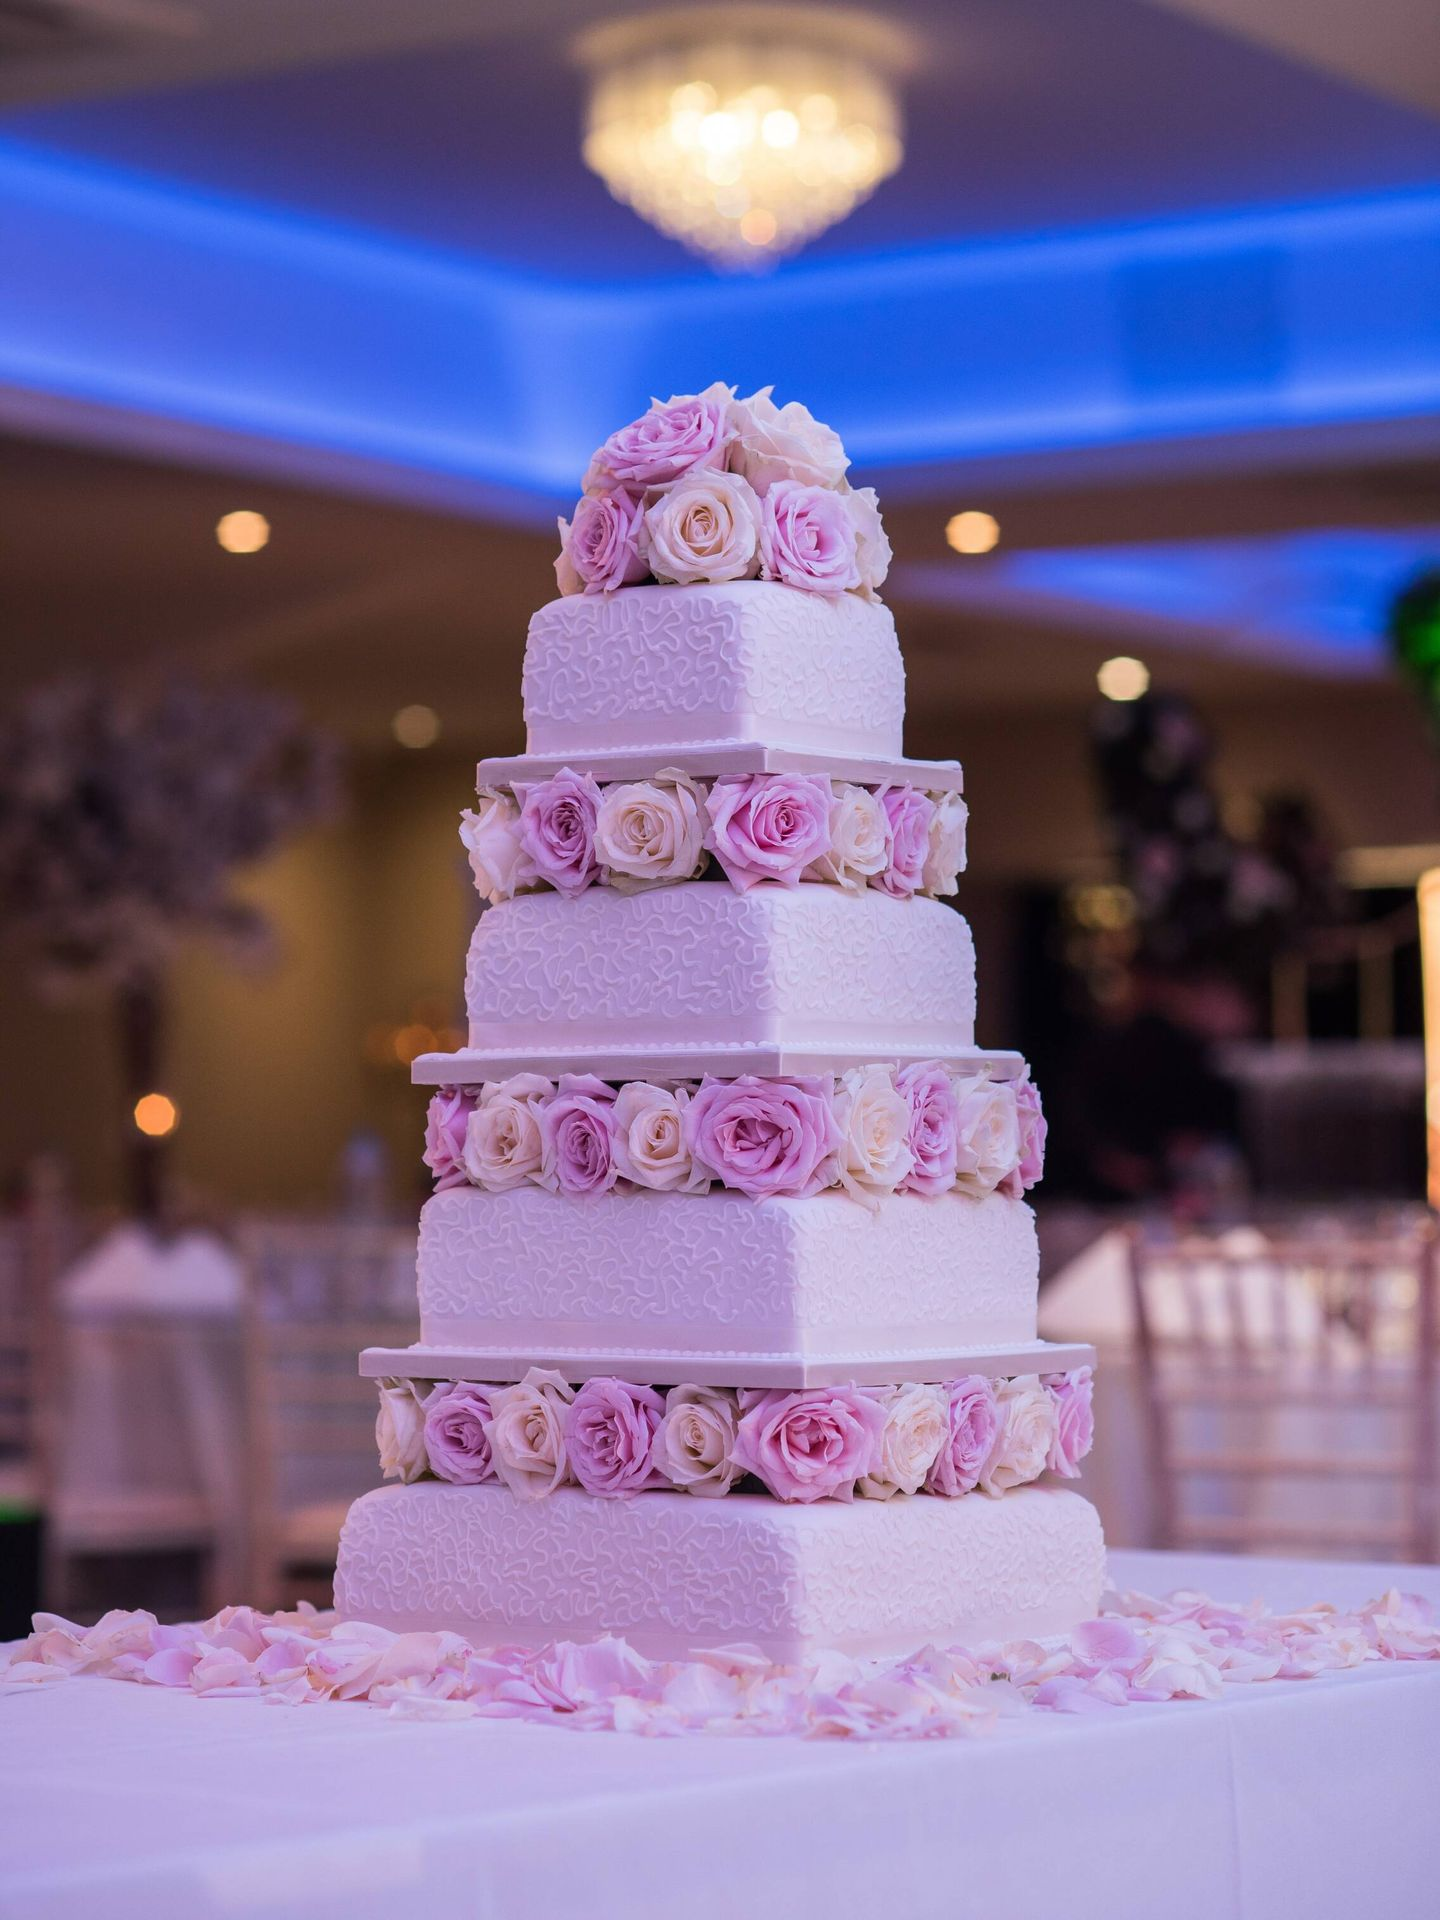 Tendencias para tartas de boda en 2022. (Jai Kumar para Unsplash)